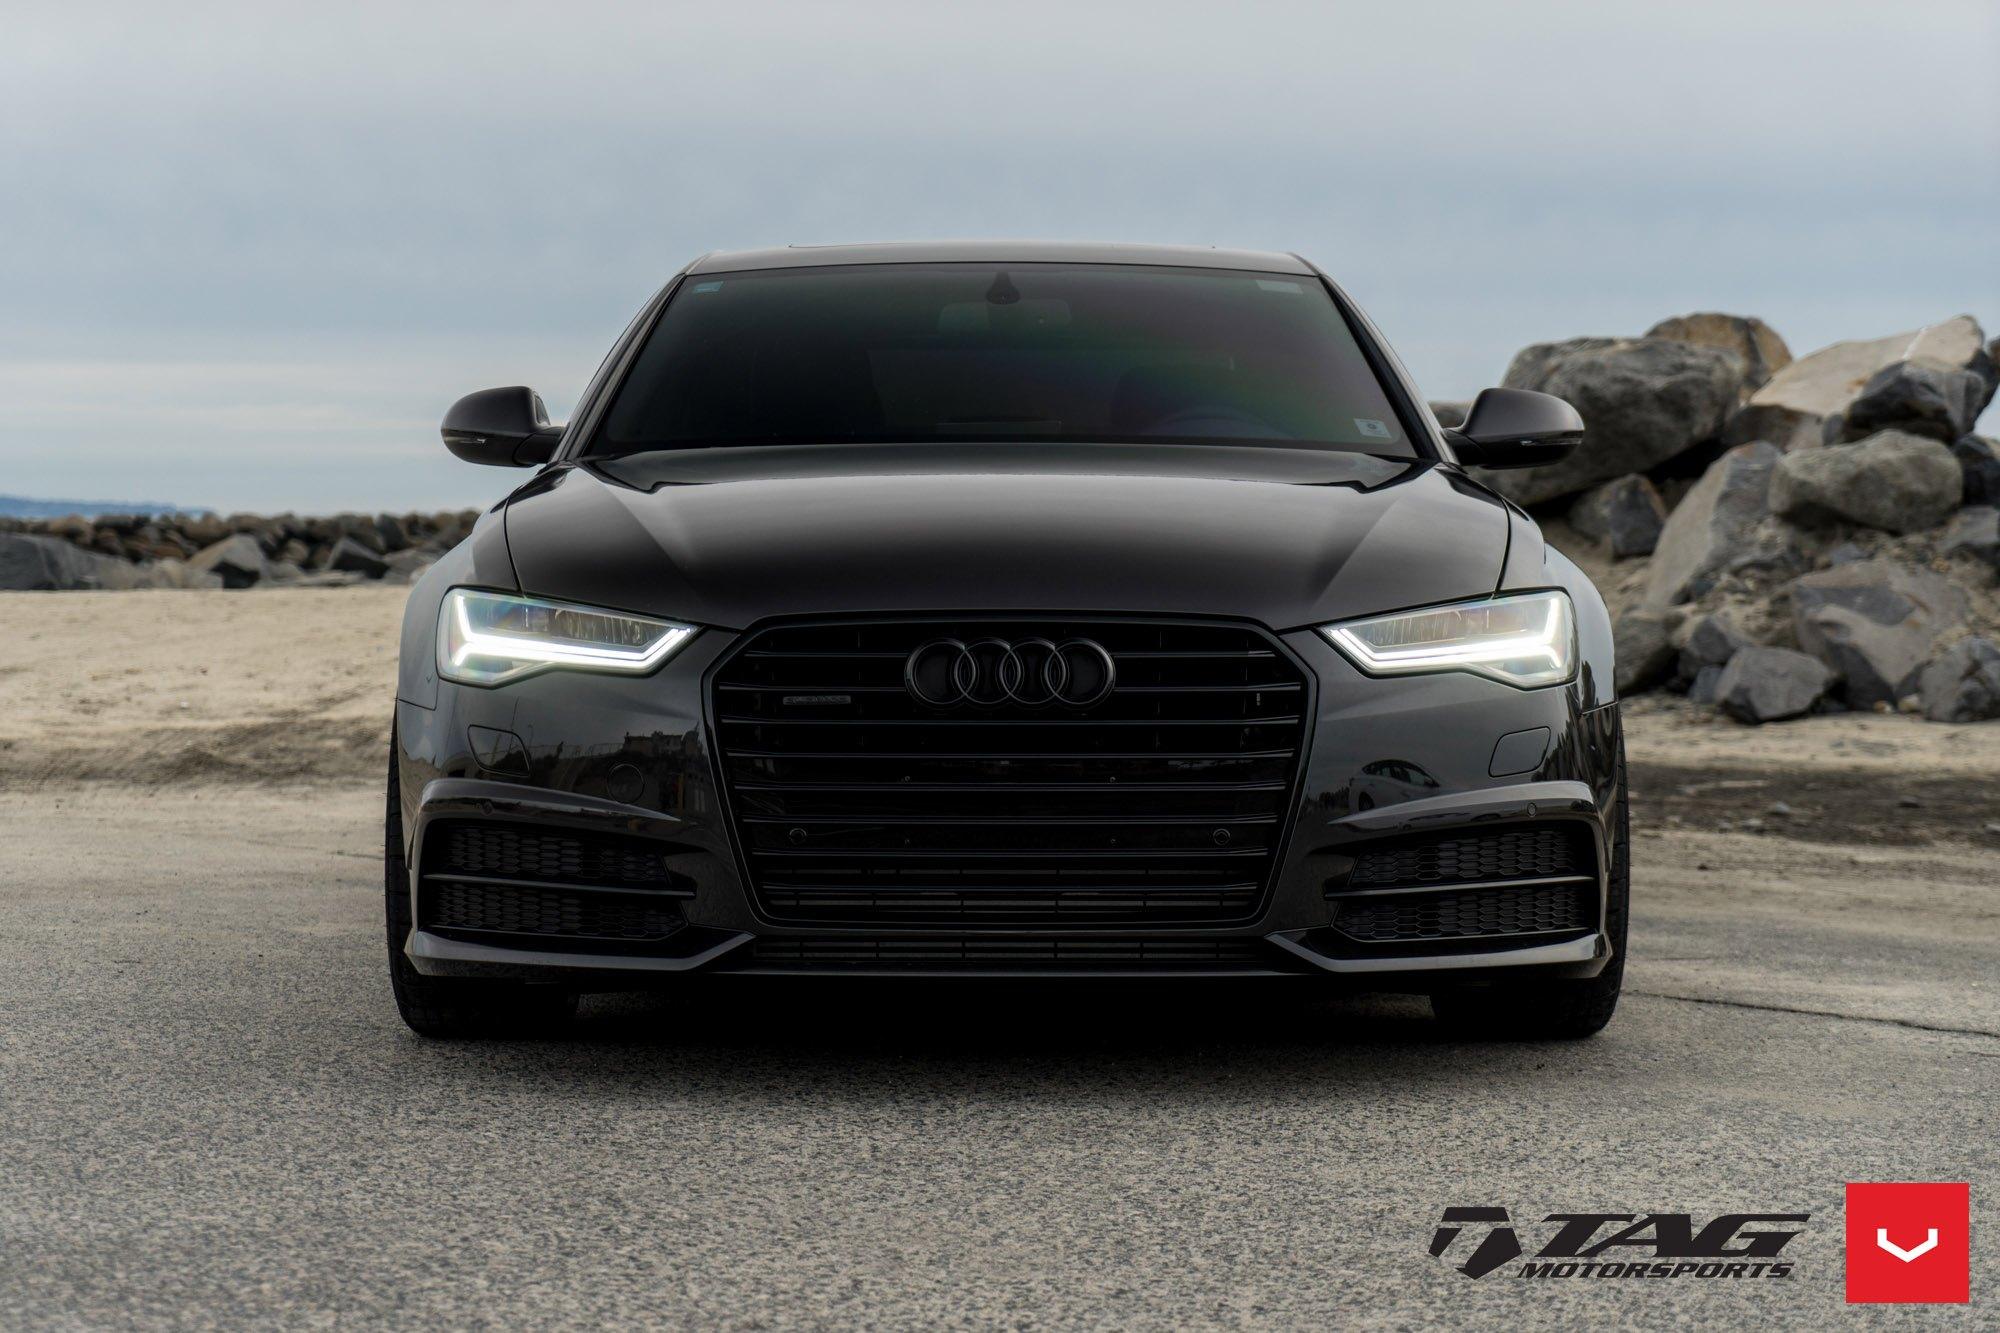 All Black Audi A6 Quattro On Vossen Vfs2 Rims Carid Com